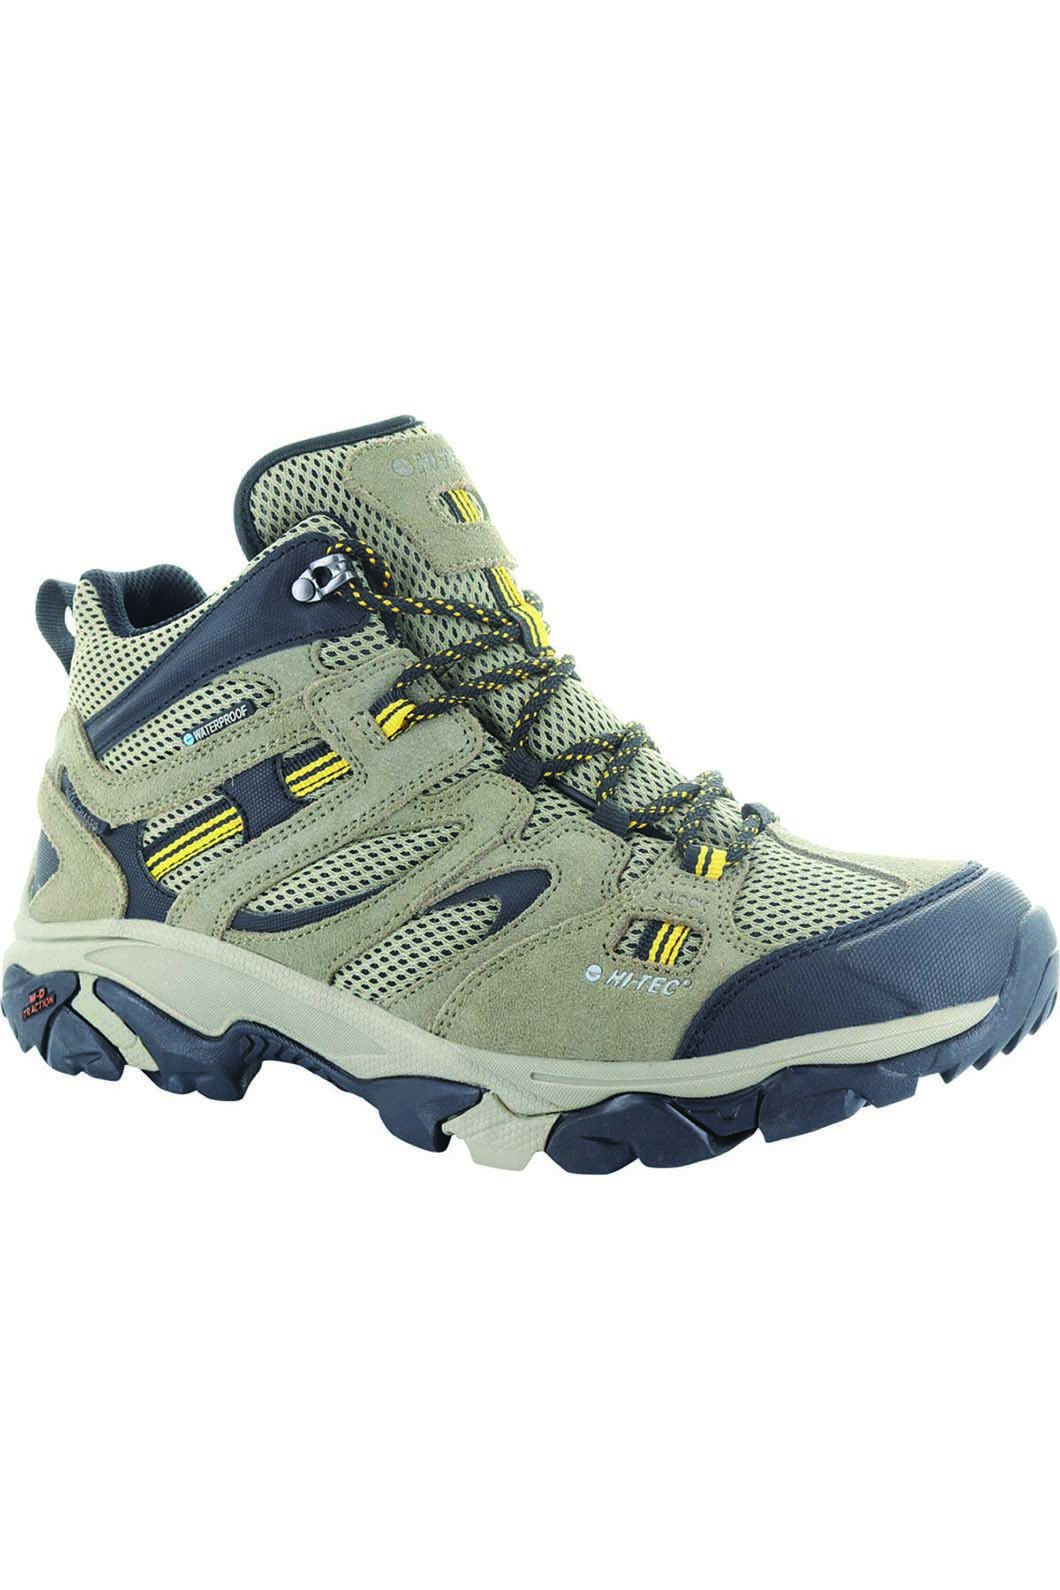 Hi-Tec Men's Ravus Adventure Hiking Boots, Taupe/Stone/Core Gold, hi-res